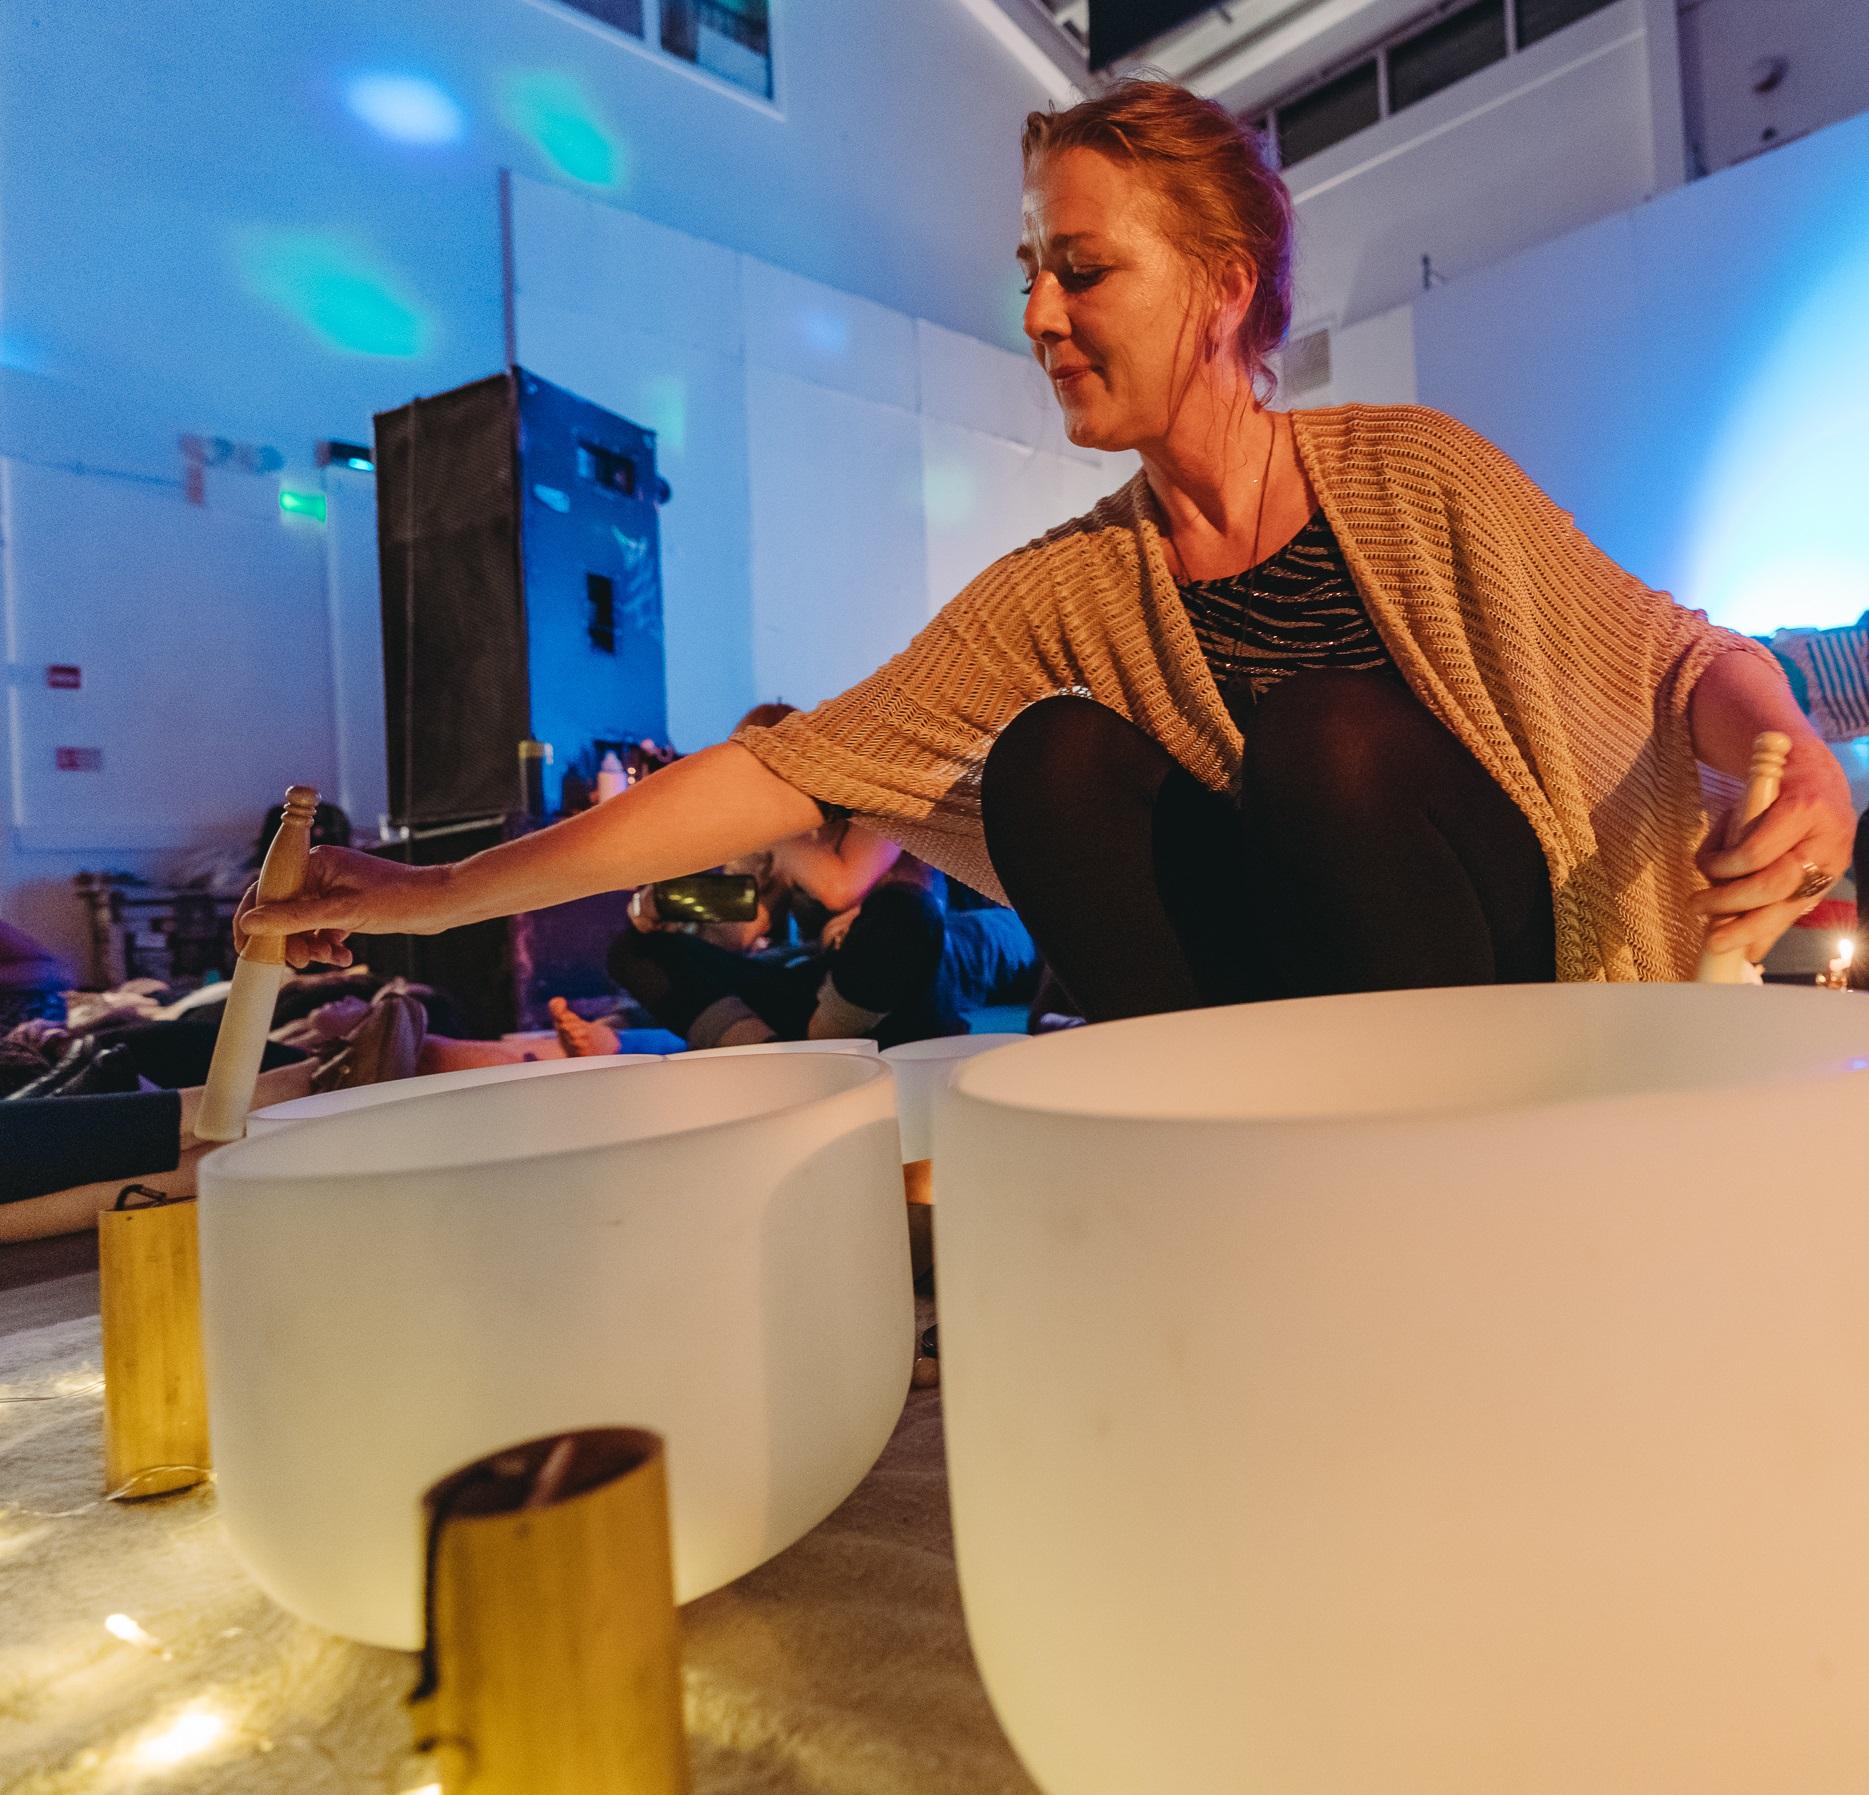 Sound bath online corporate wellness